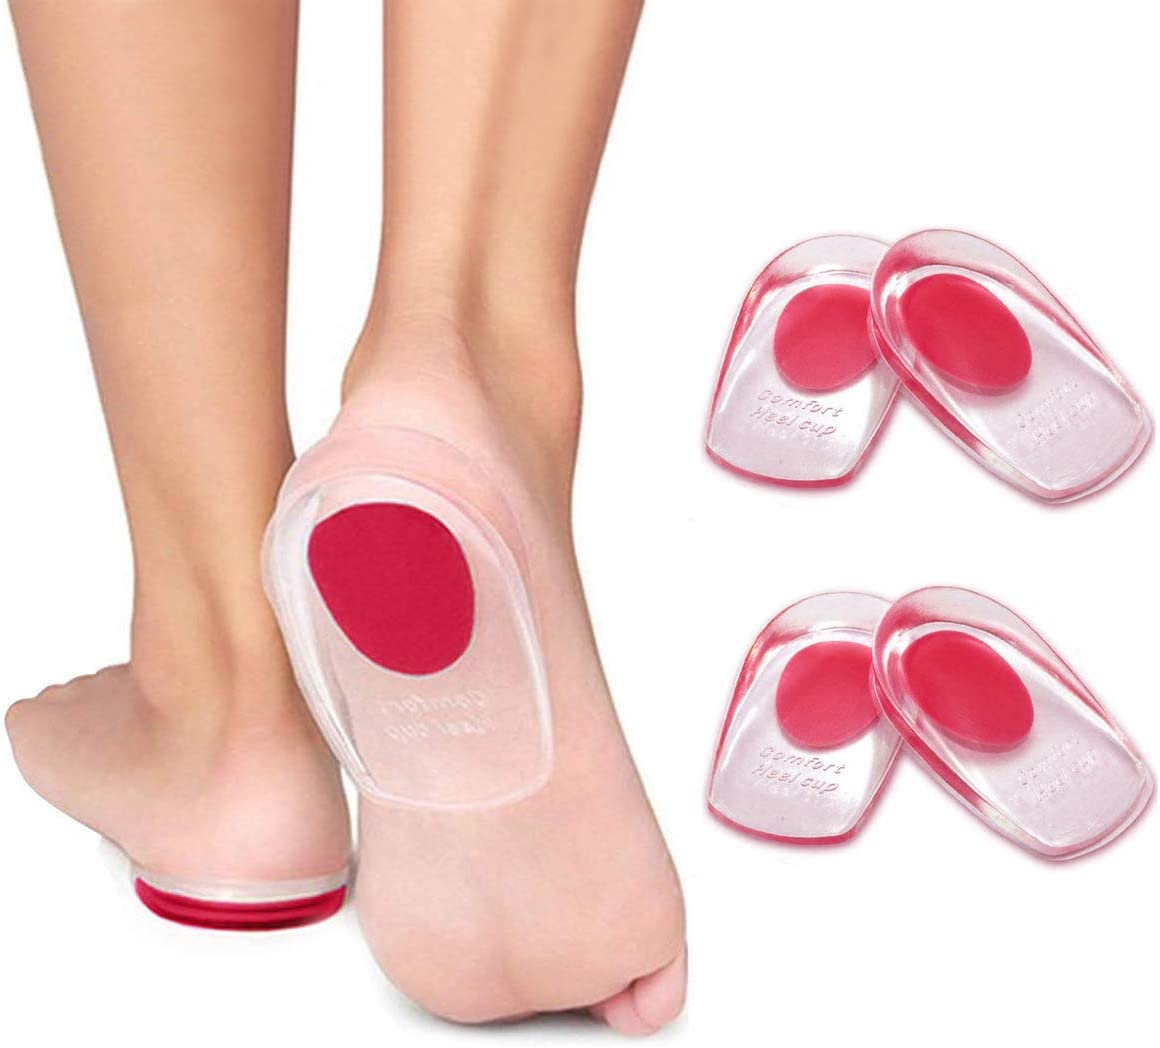 2 Pairs Popular standard Gel Heel Cups P Inserts Plantar Fasciitis Silicone 1 year warranty